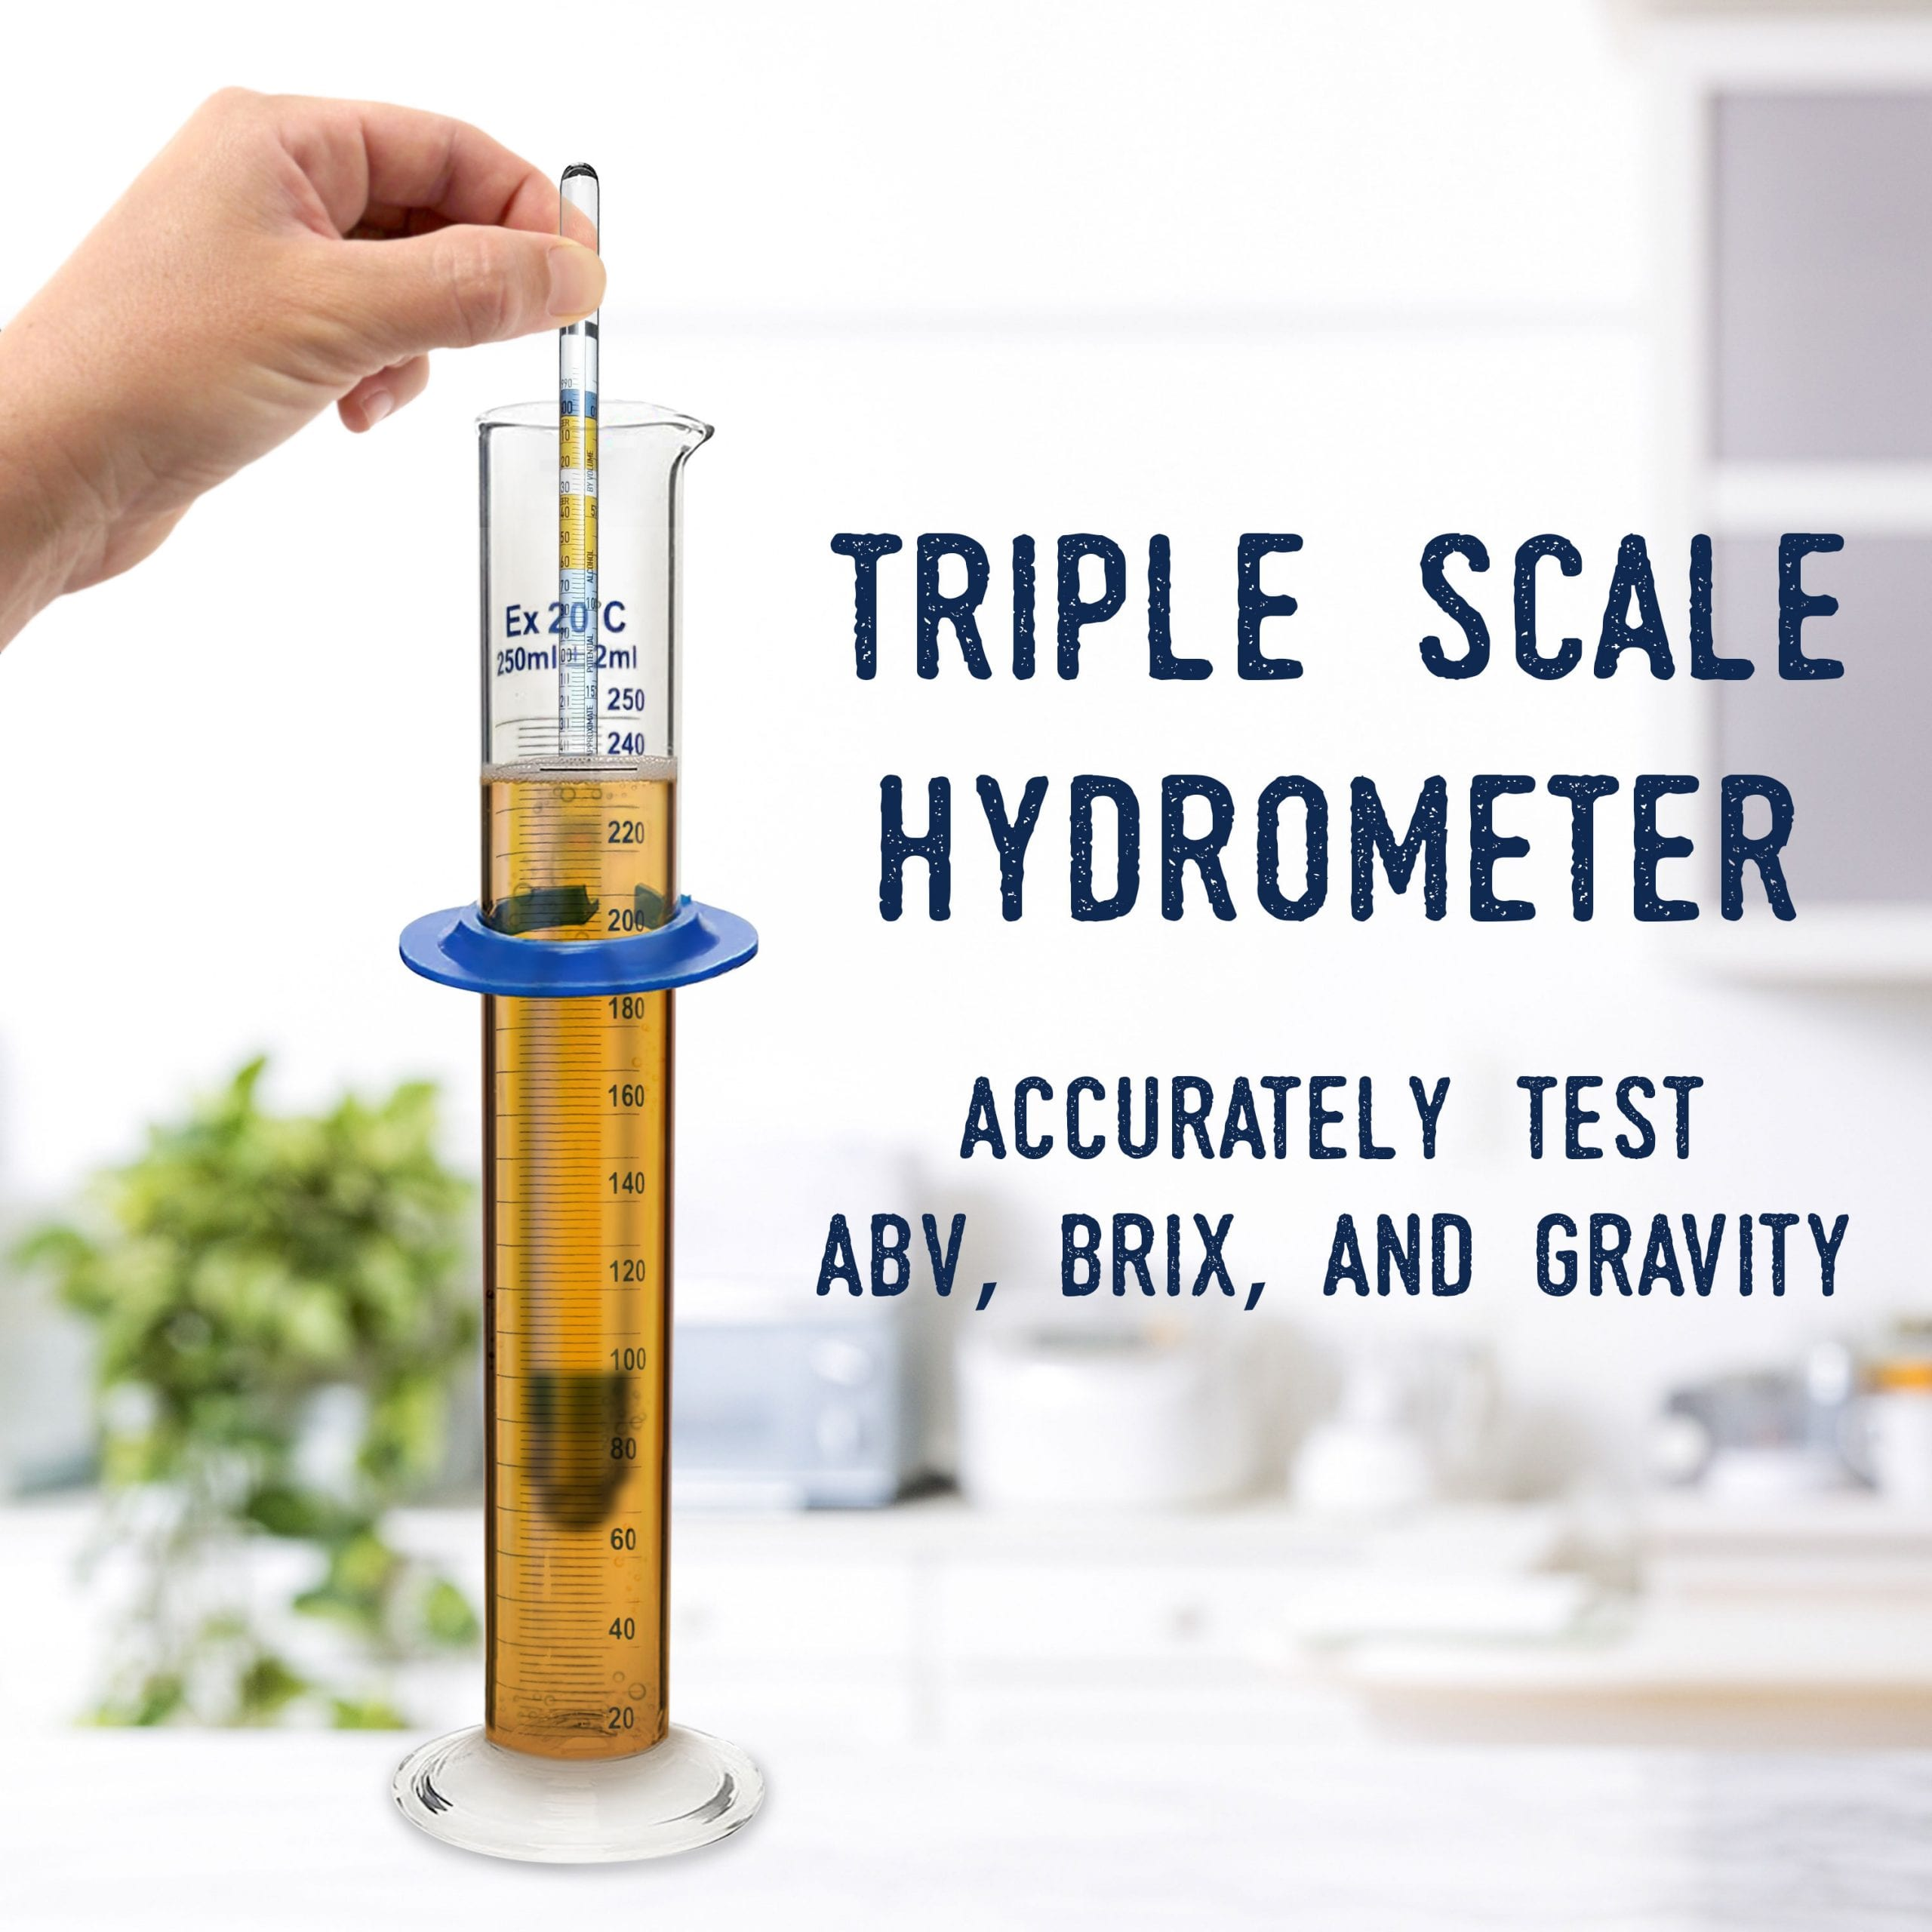 Hydrometer_image-shot-4_glass-3